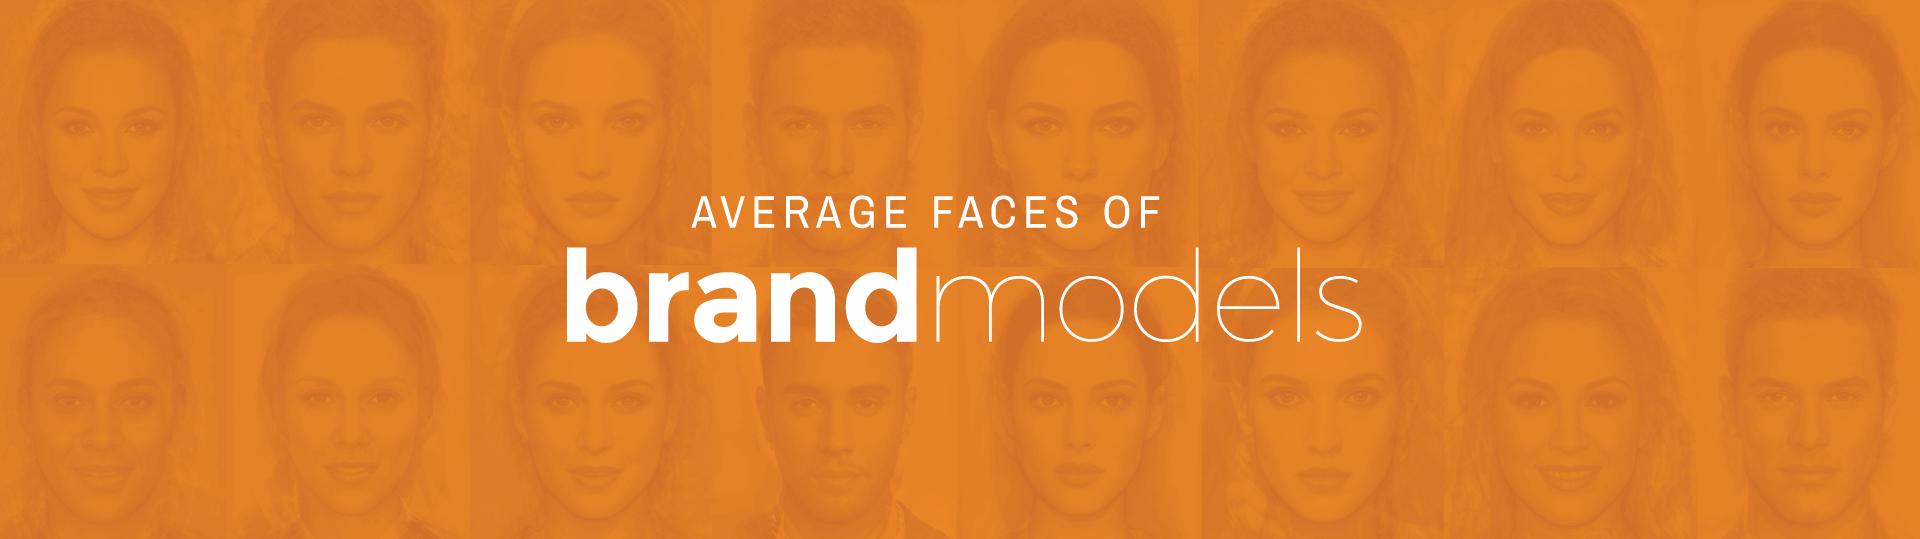 Average-Faces-of-Brand-Models_Banner (1)